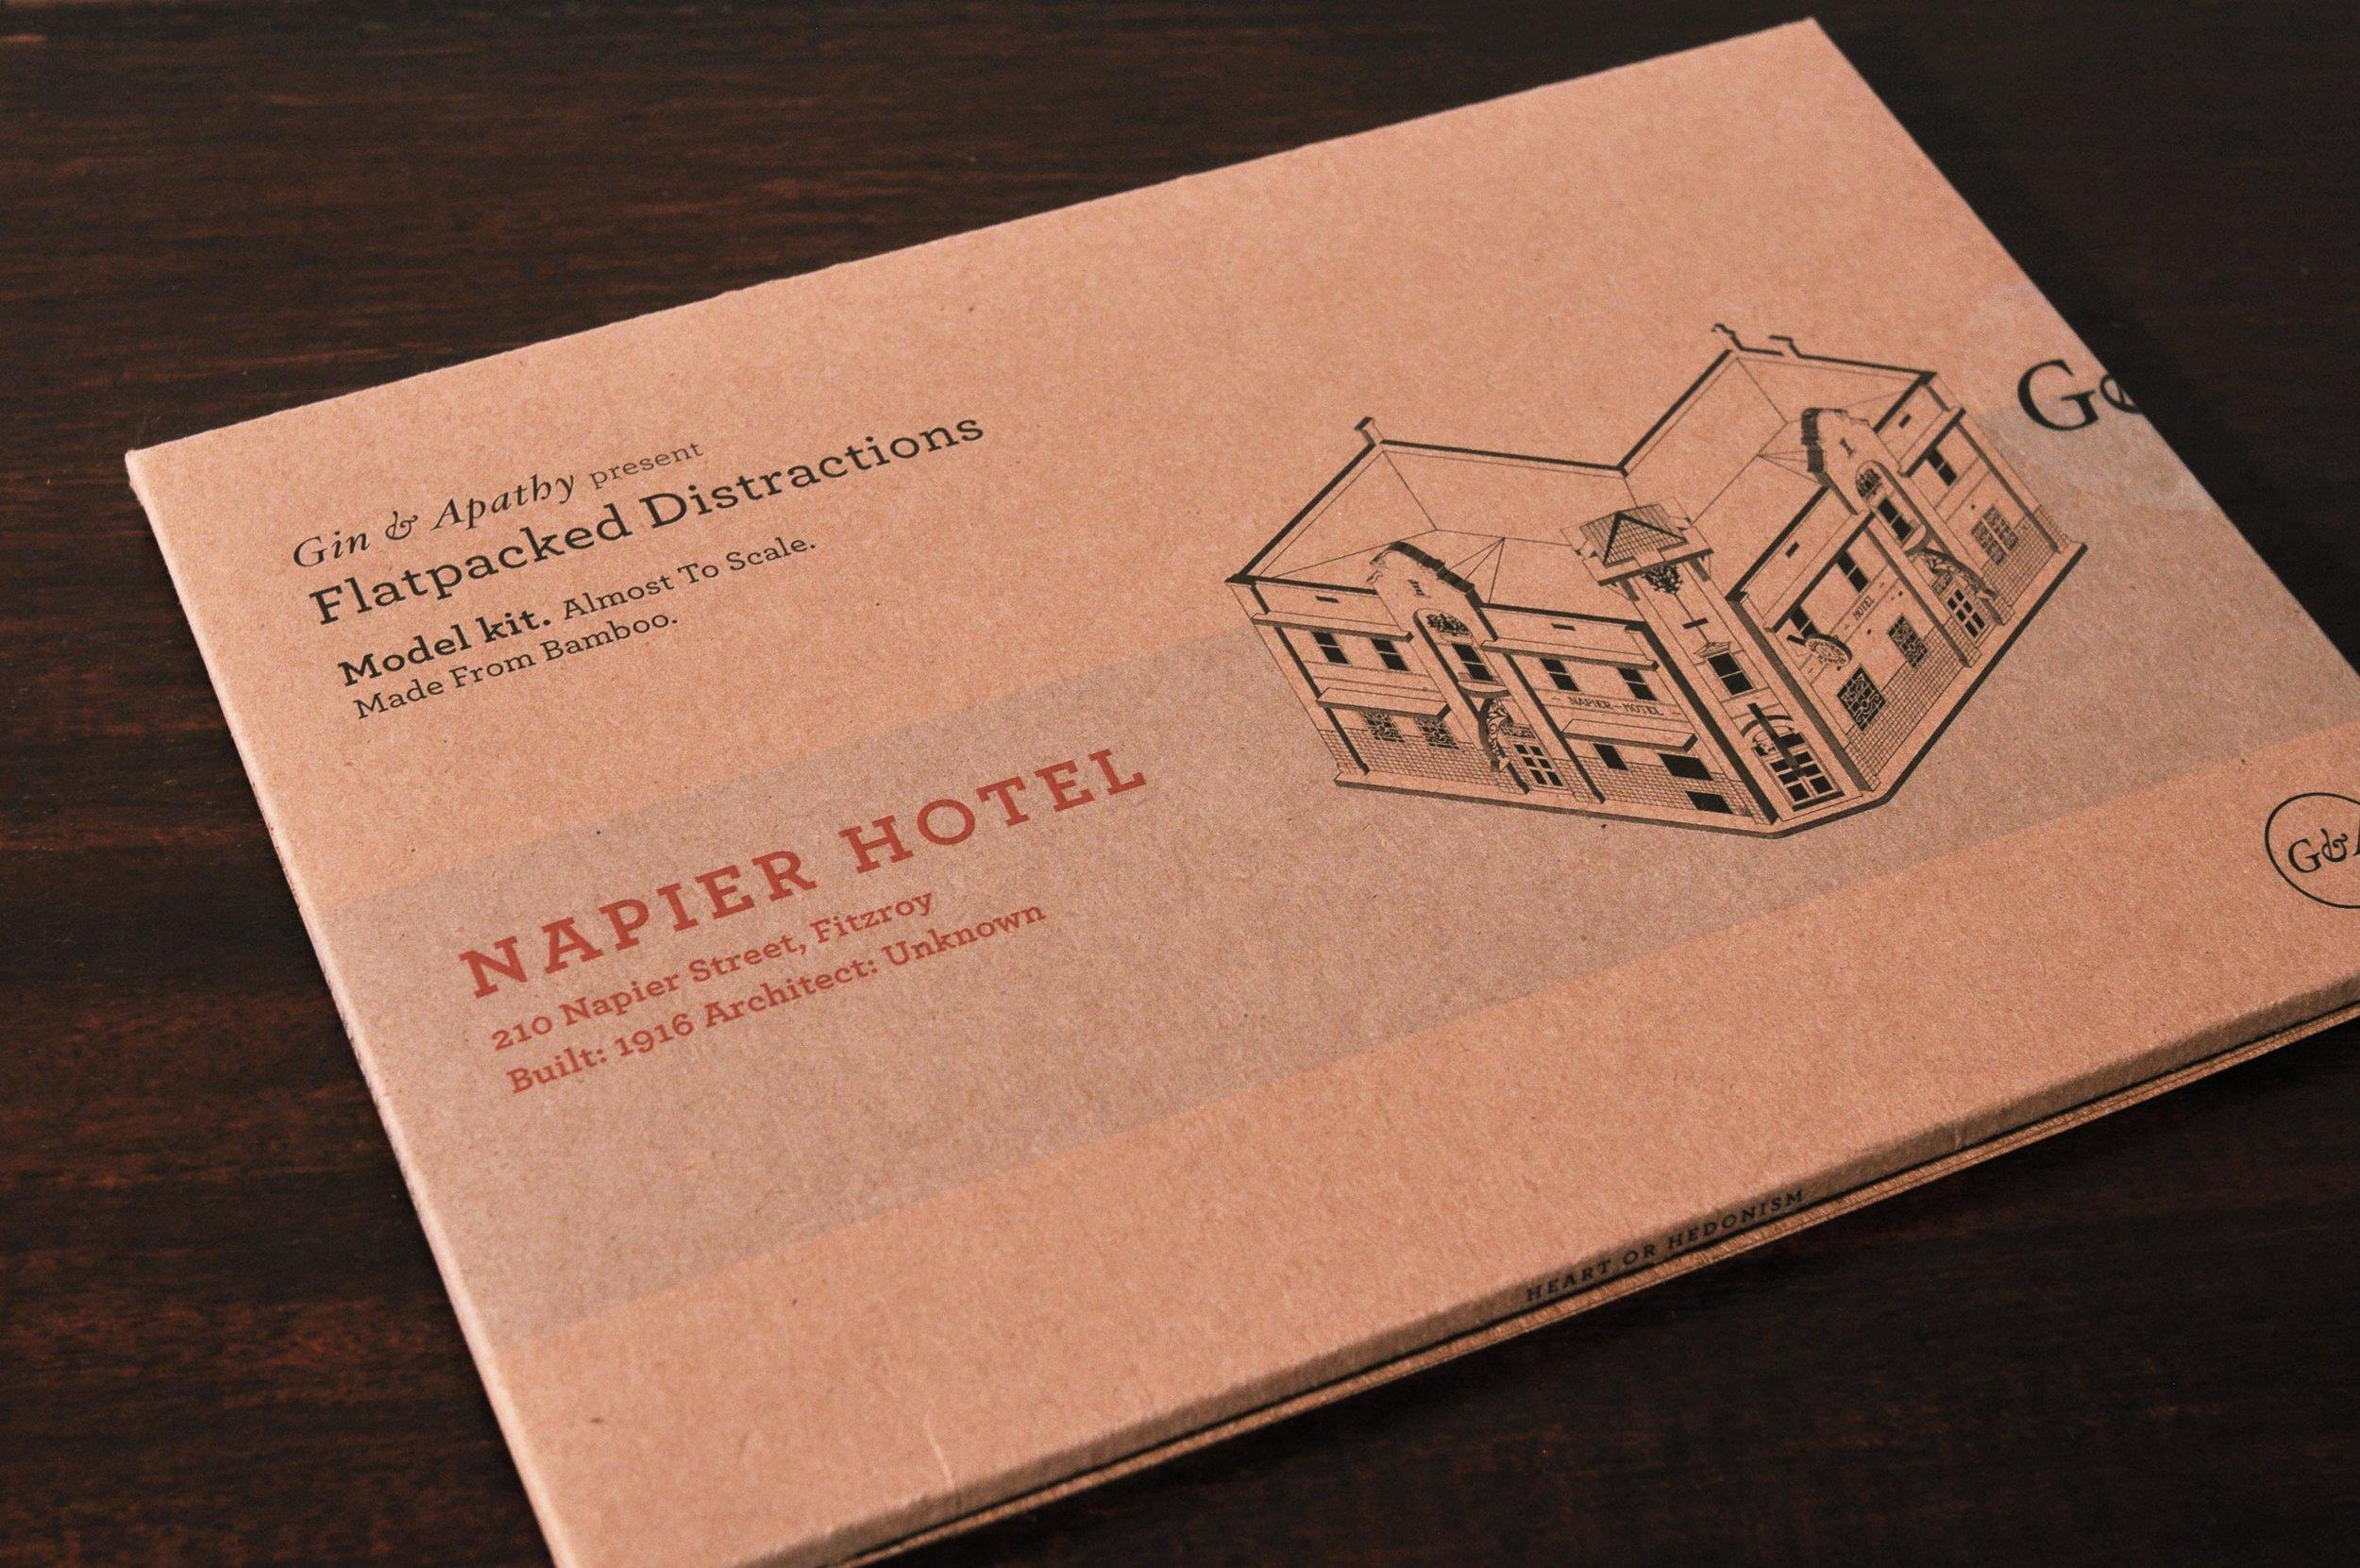 10  Napier Hotel Kit — Gin & Apathy